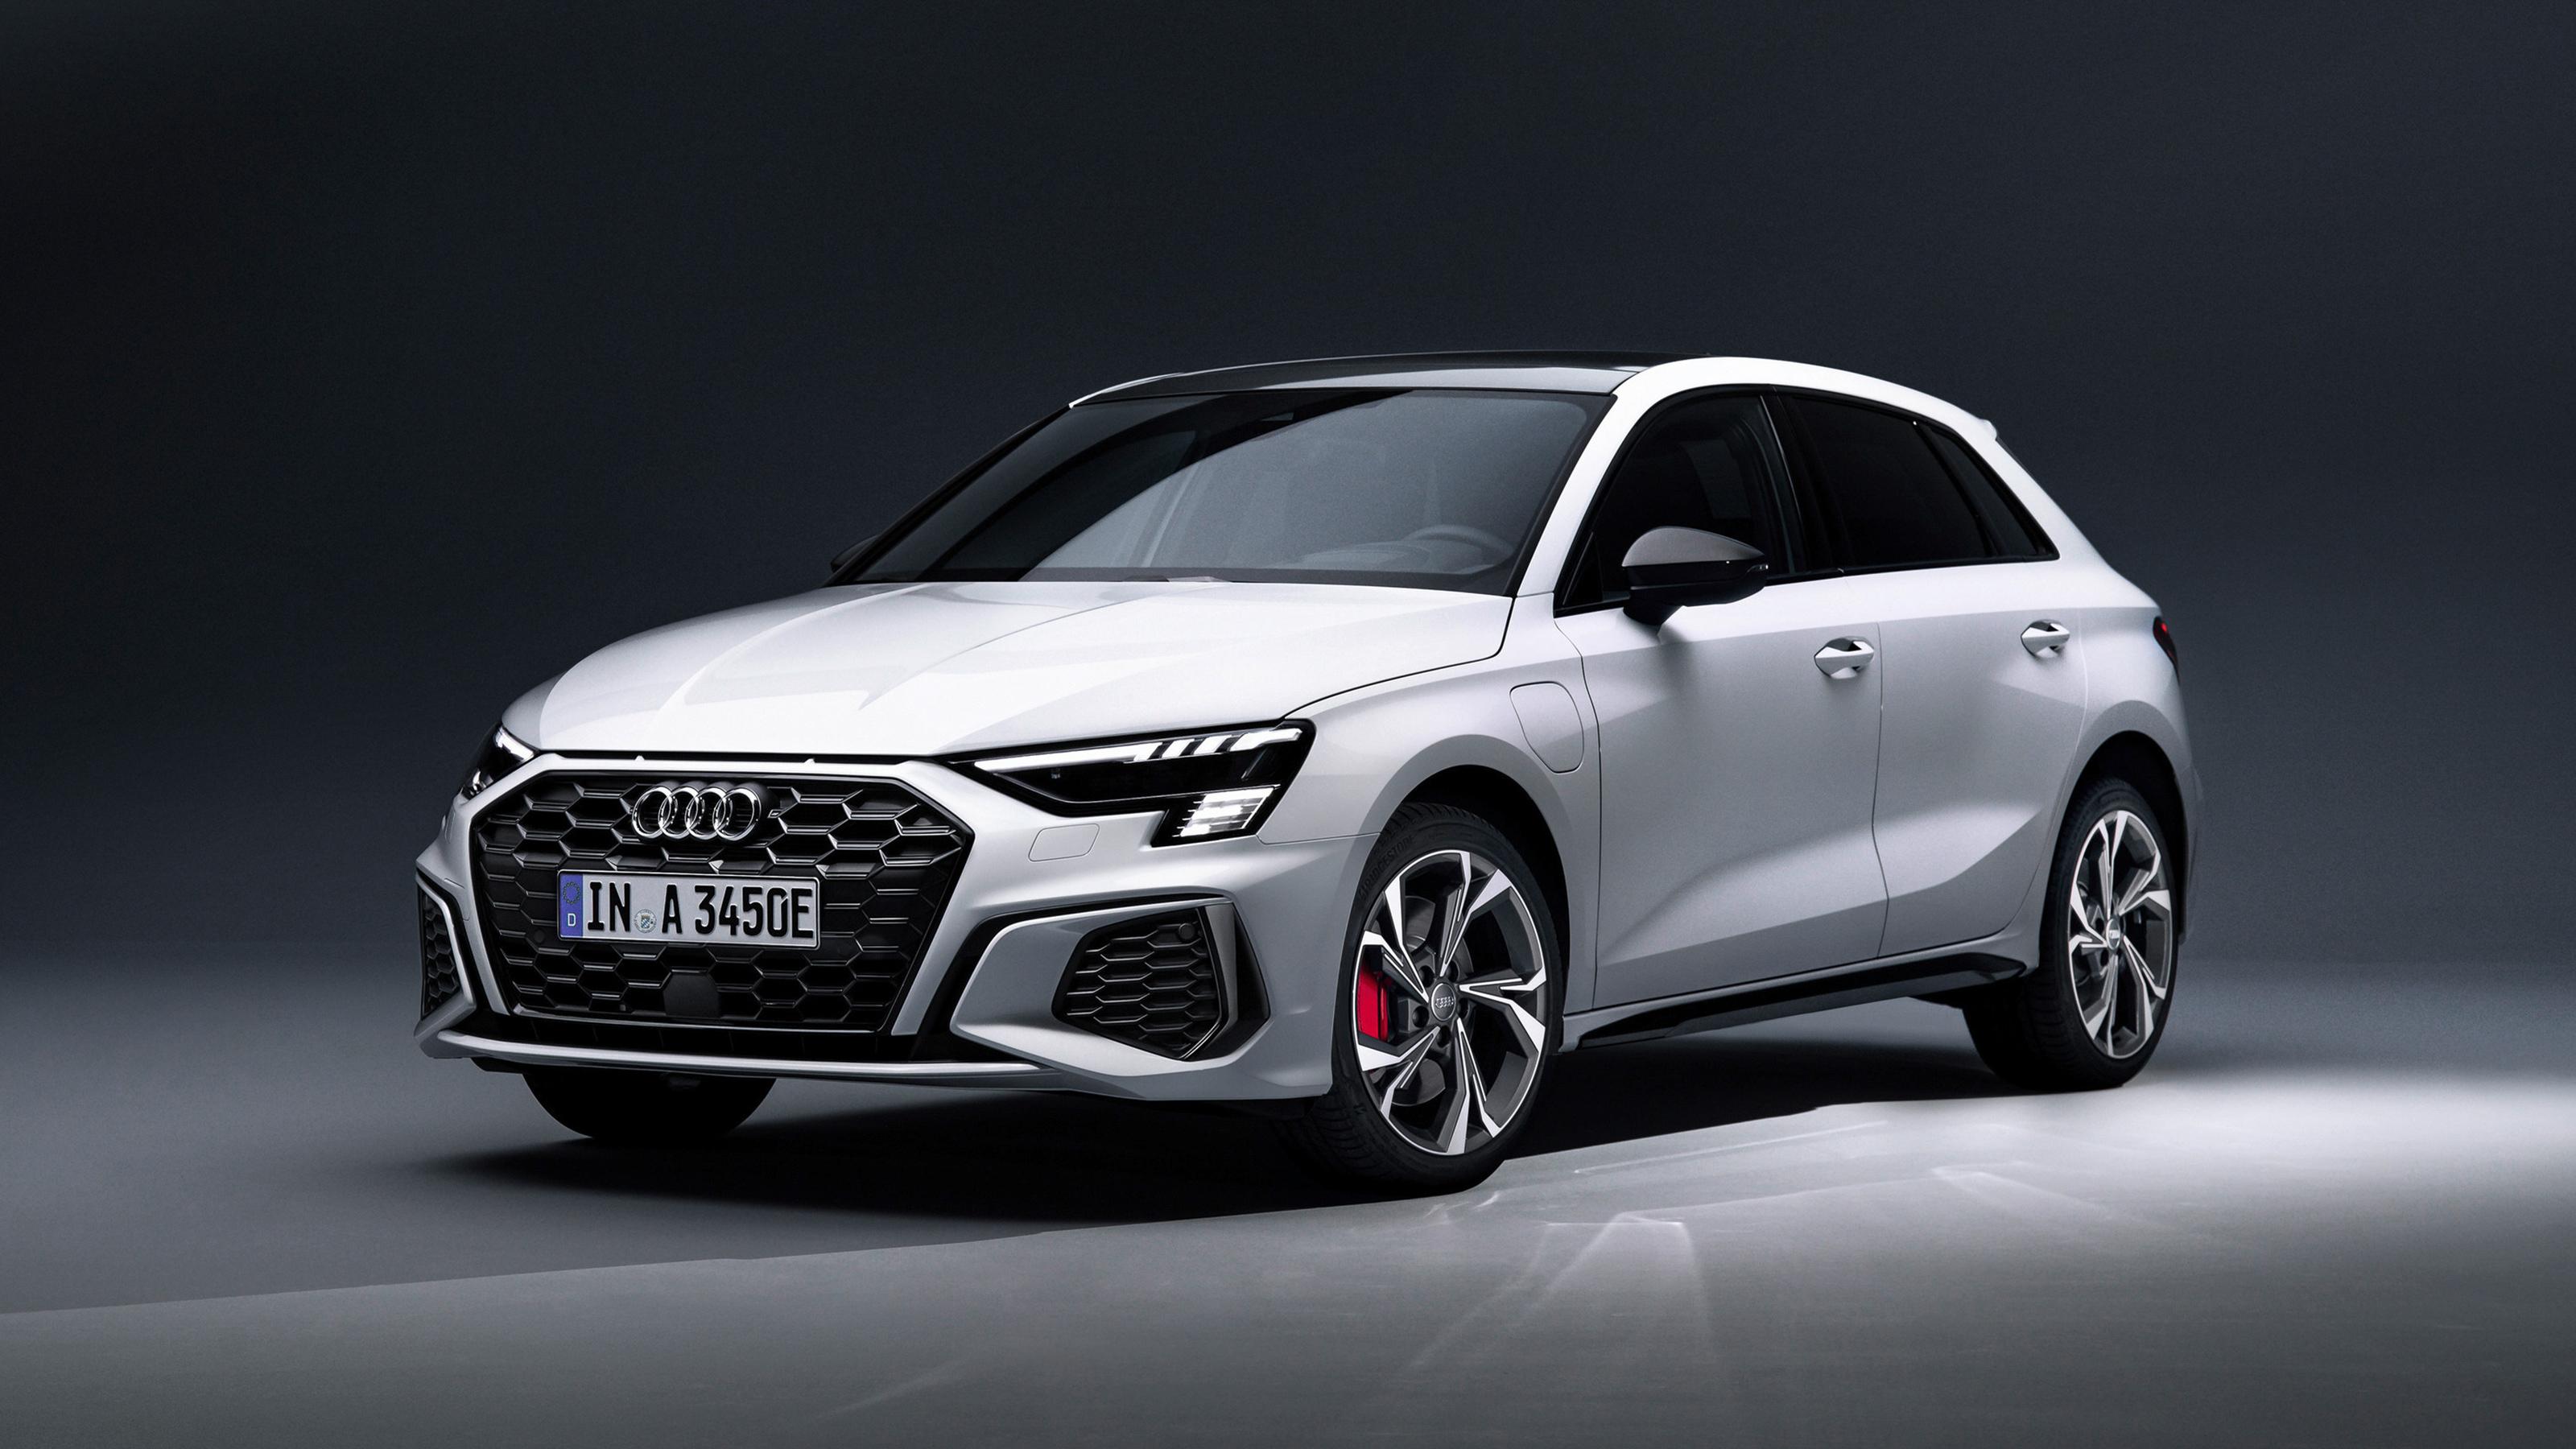 New Audi A3 Sportback 45 TFSI e plug-in hybrid revealed ...